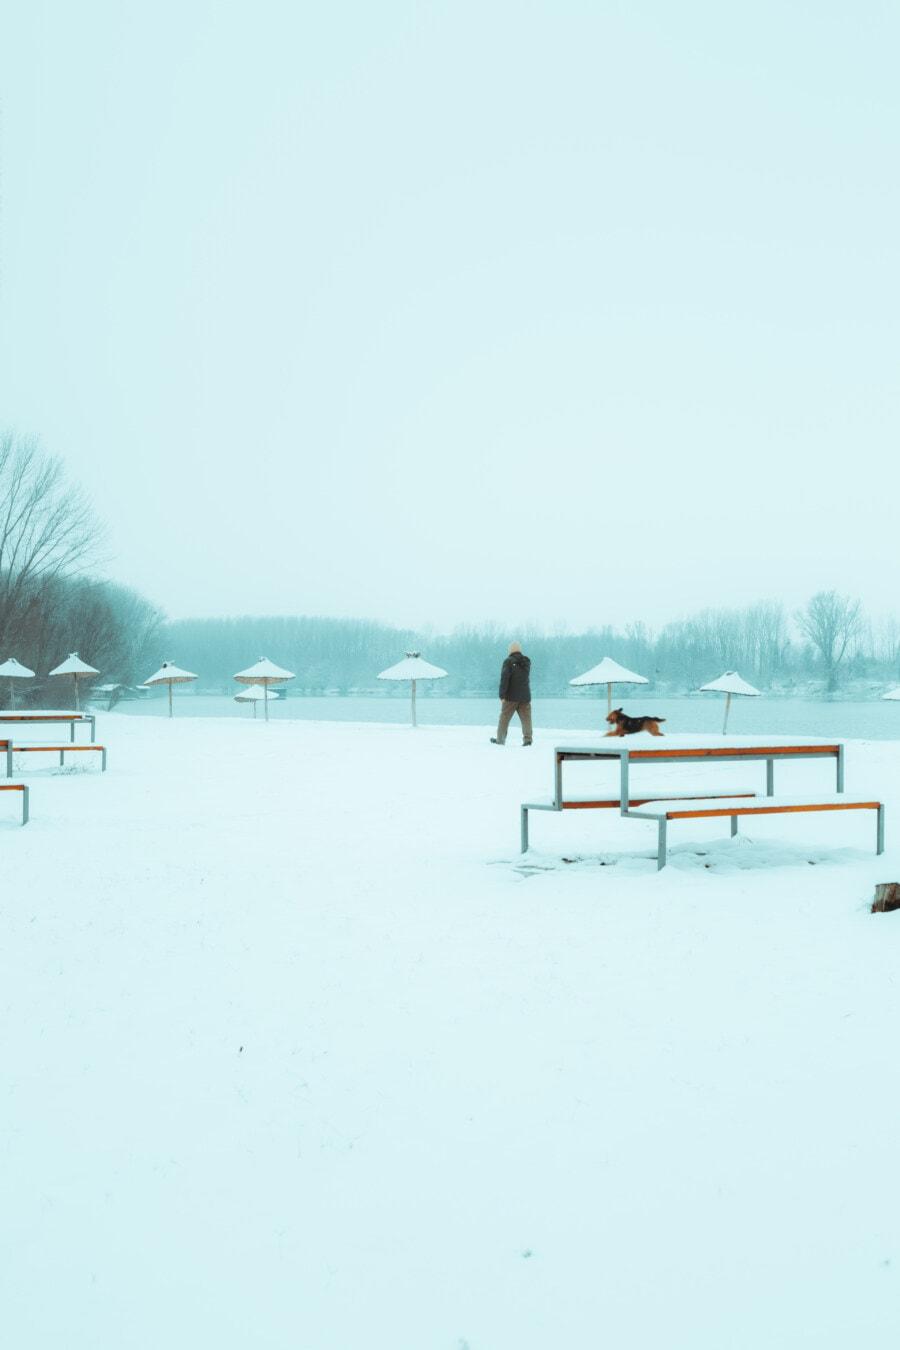 snowy, winter, man, beach, walking, running, dog, water, cold, snow